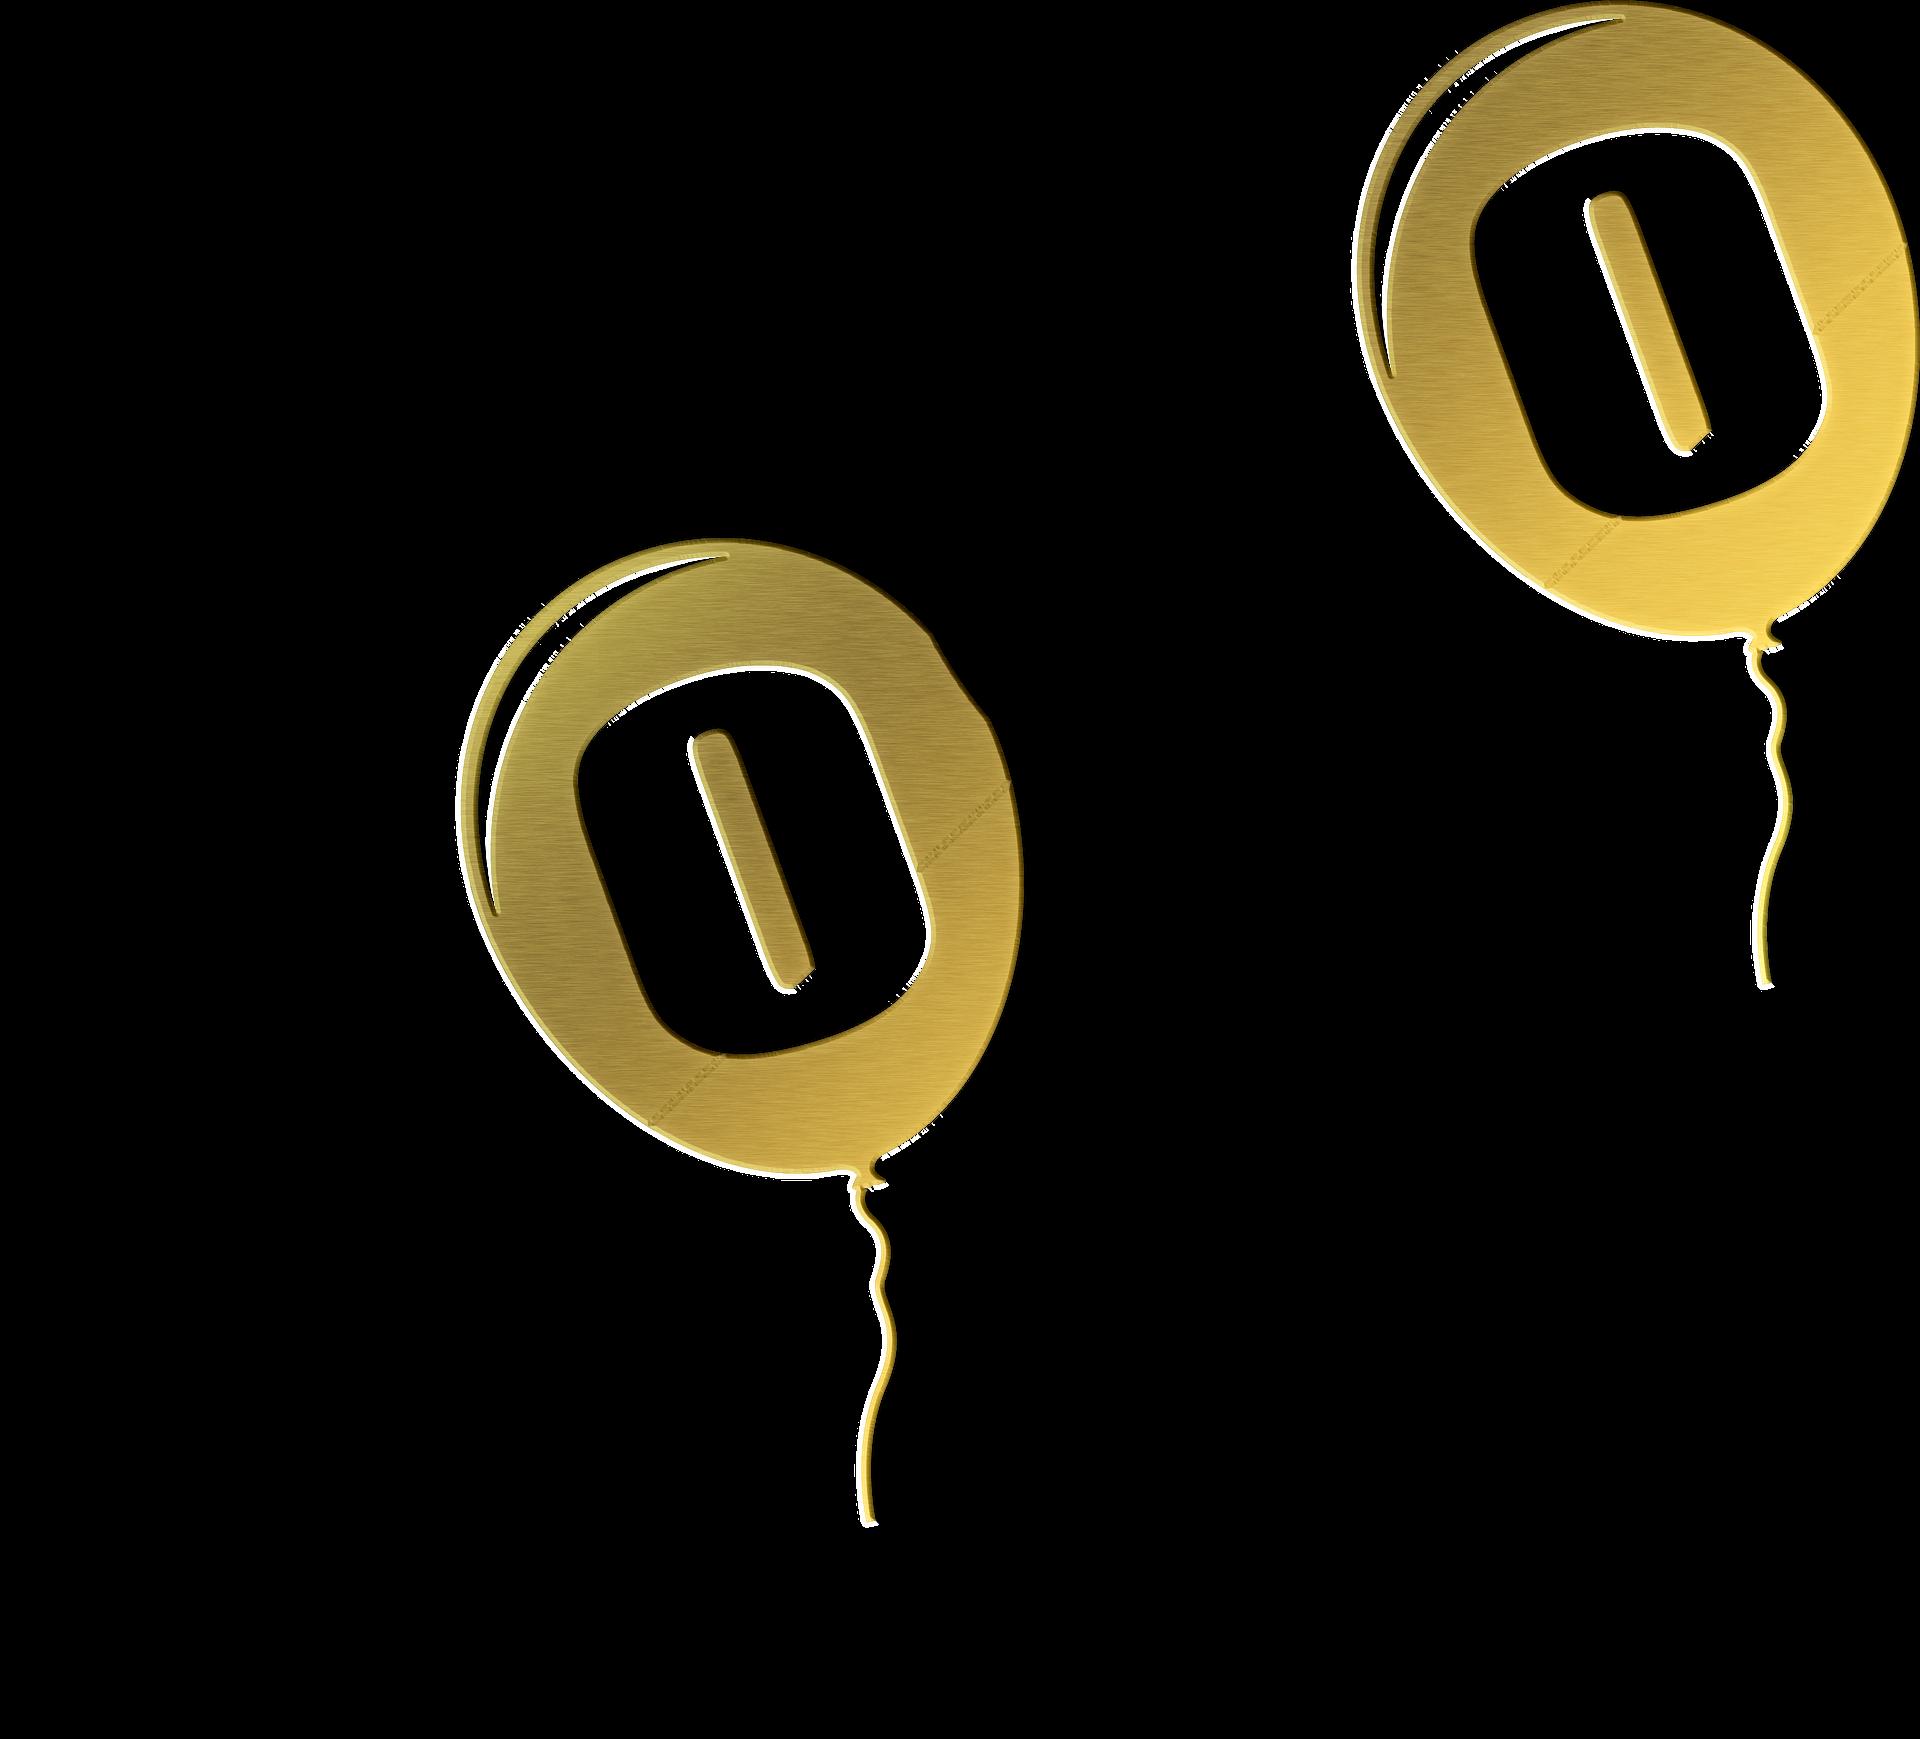 https://m.wm.pl/2020/12/orig/new-year-balloons-4716270-1920-668928.jpg